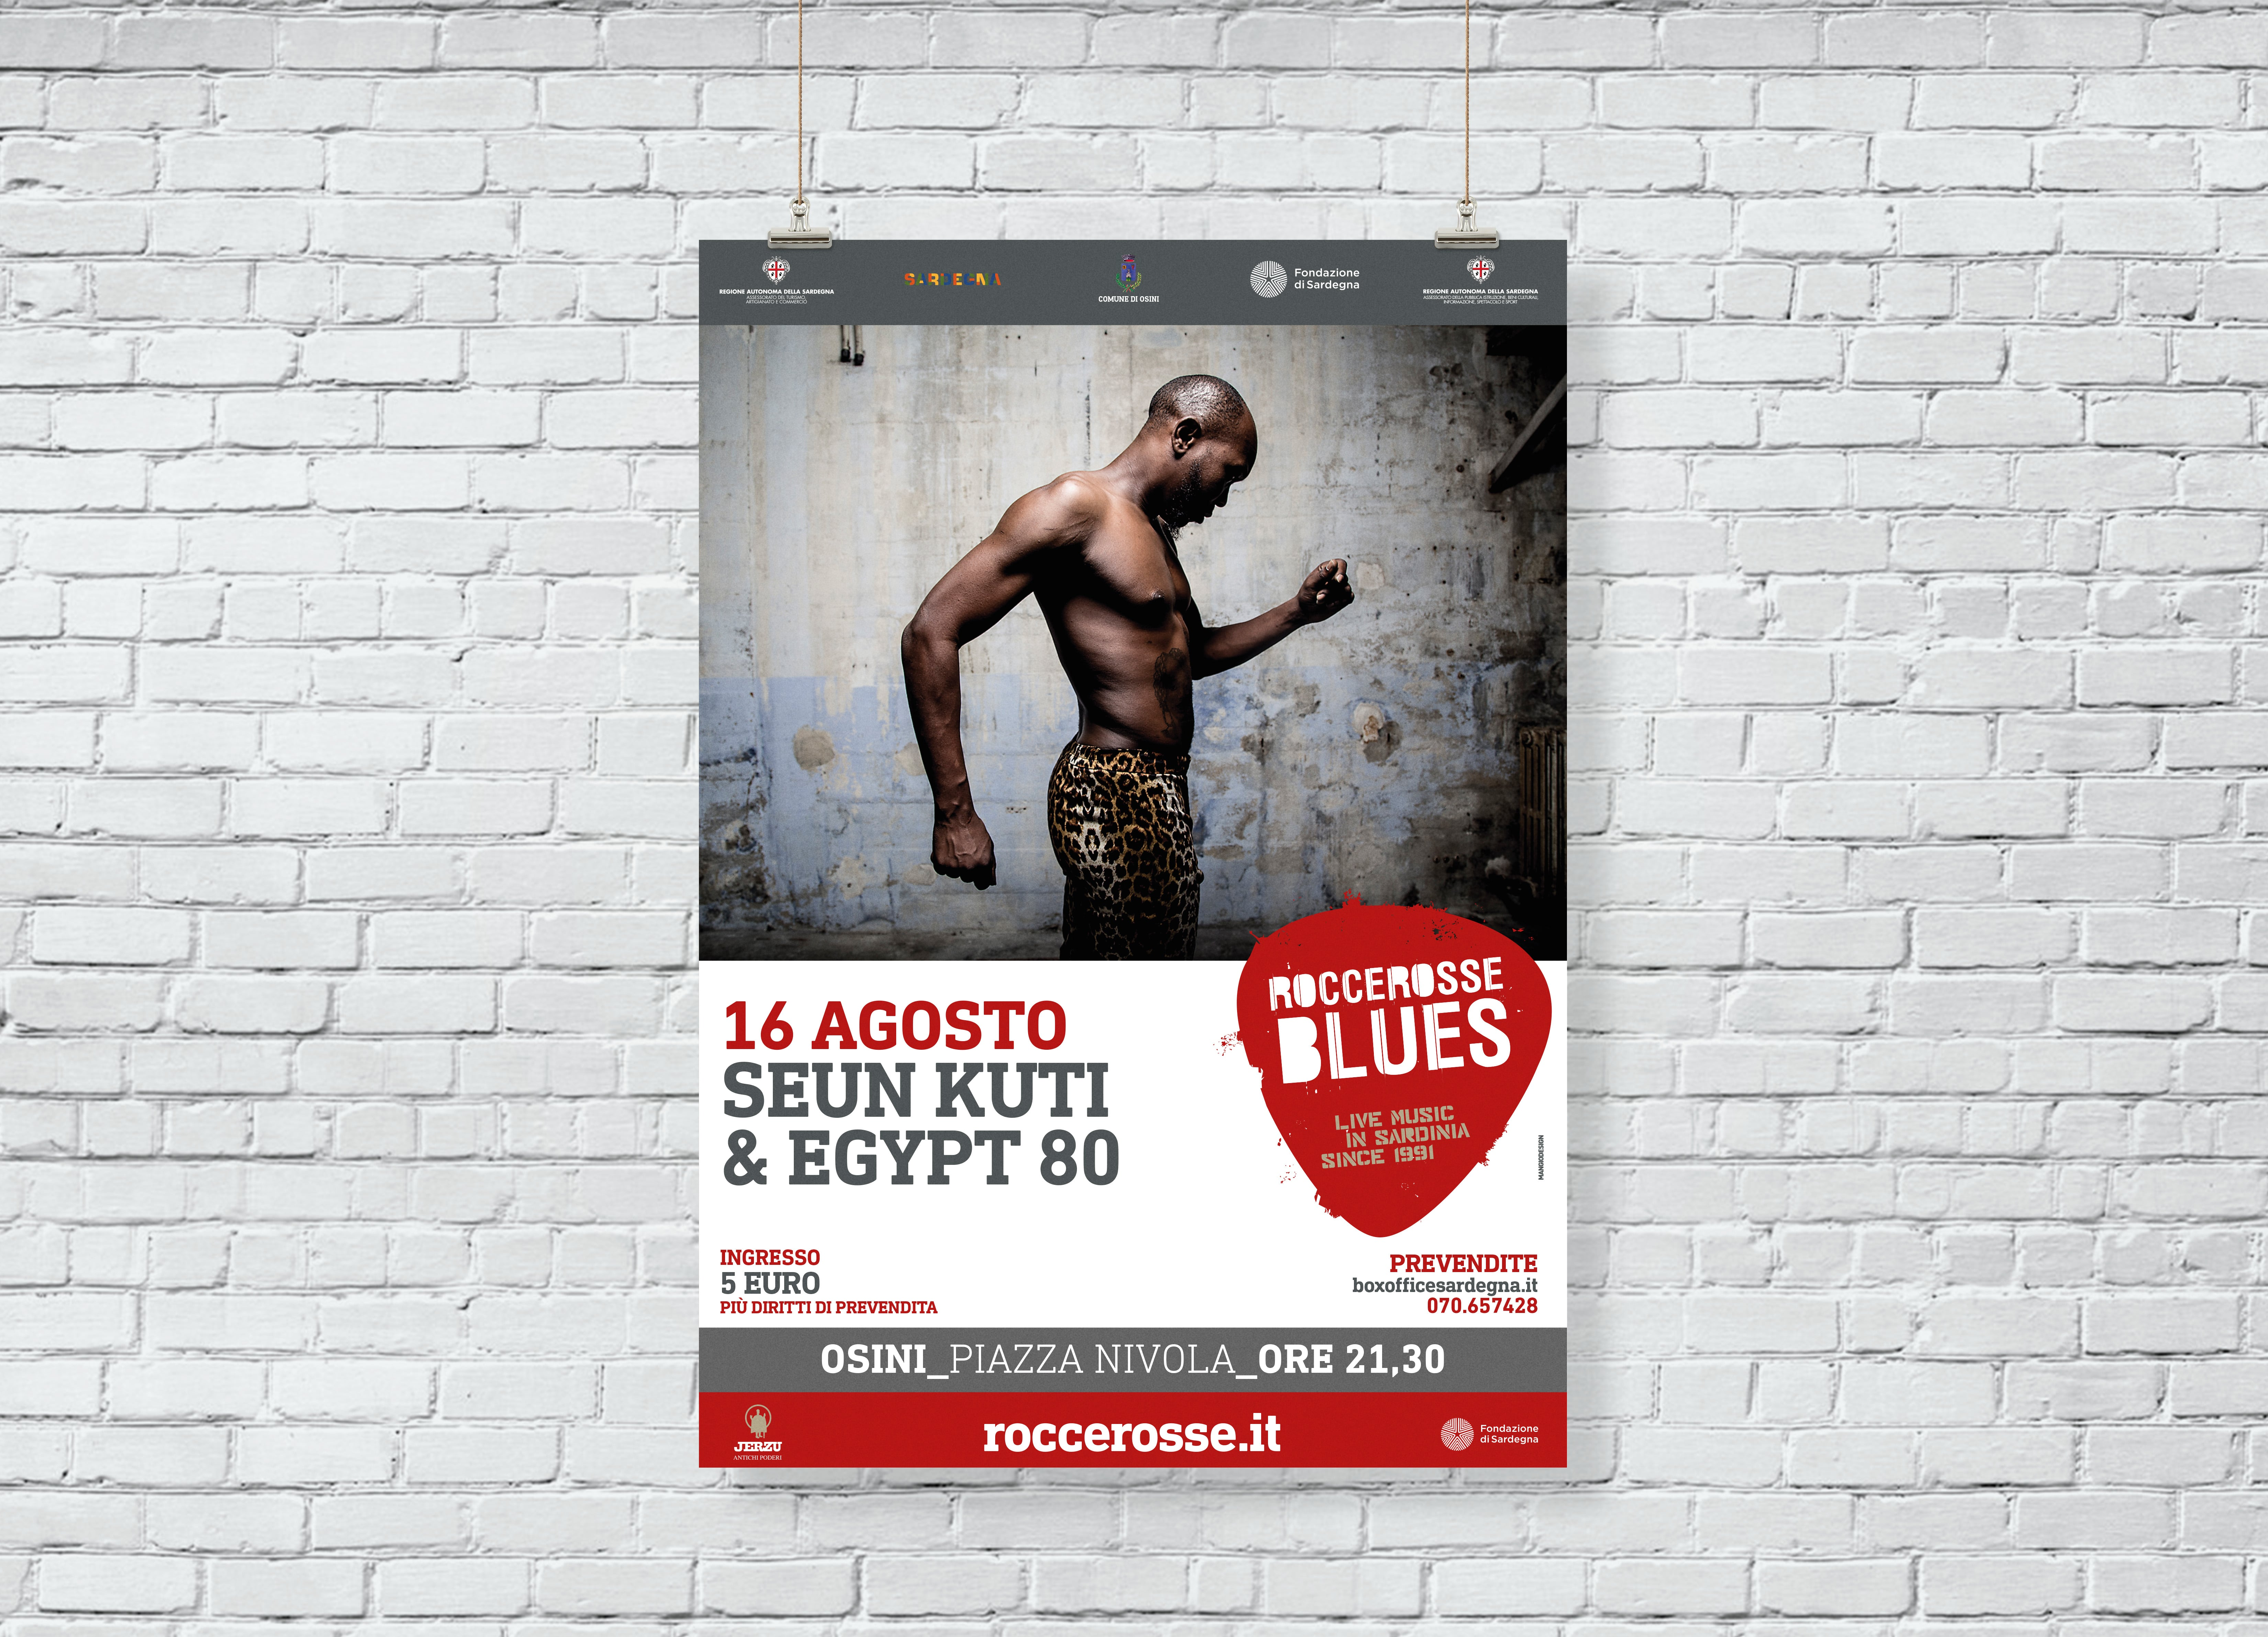 RocceRosse Blues - edizione 2018 - Poster Seun Kuti & Egypt 80